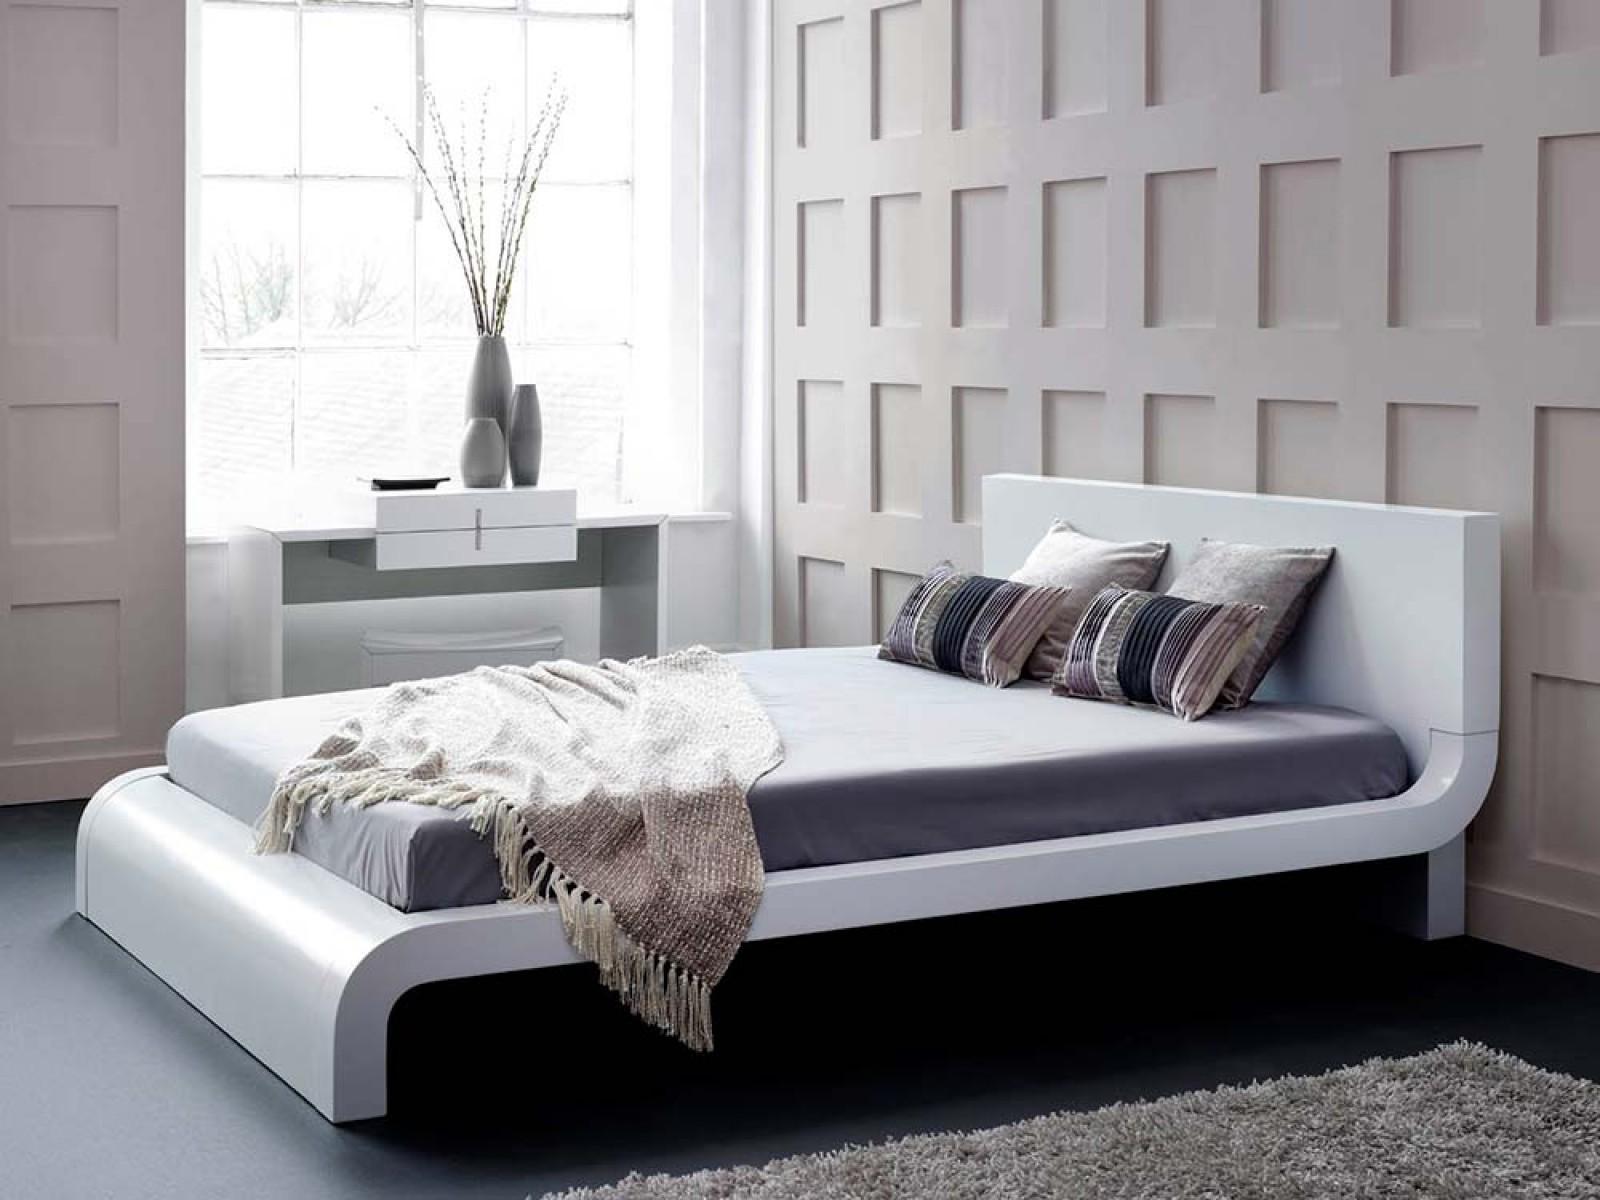 livingitup-beds-62203